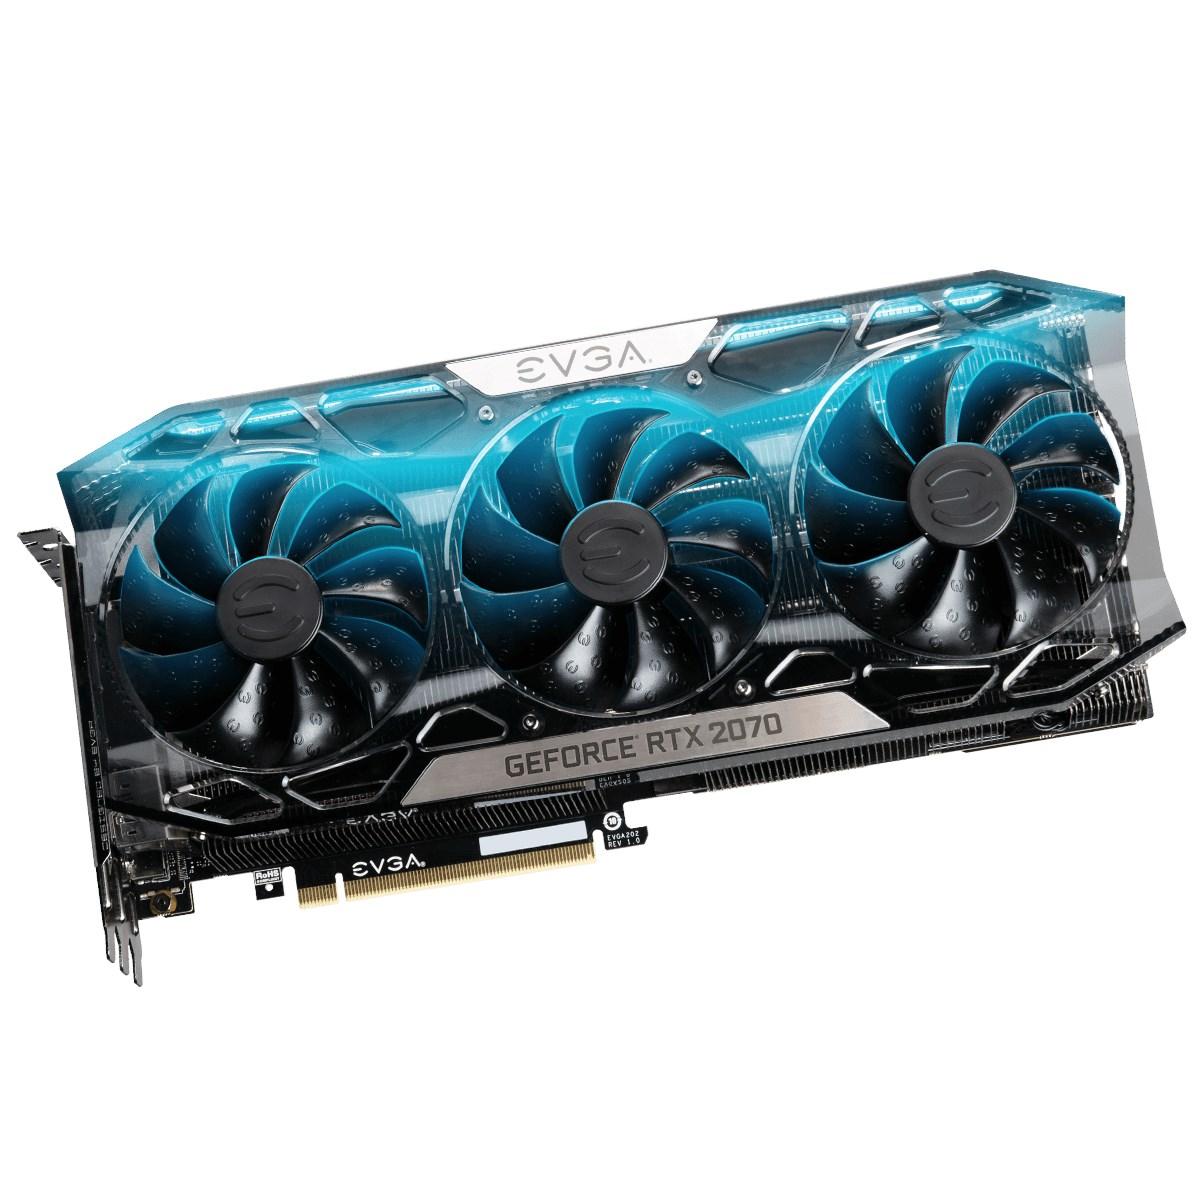 EVGA GeForce RTX 2070 8GB FTW3 Ultra Boost Graphics Card